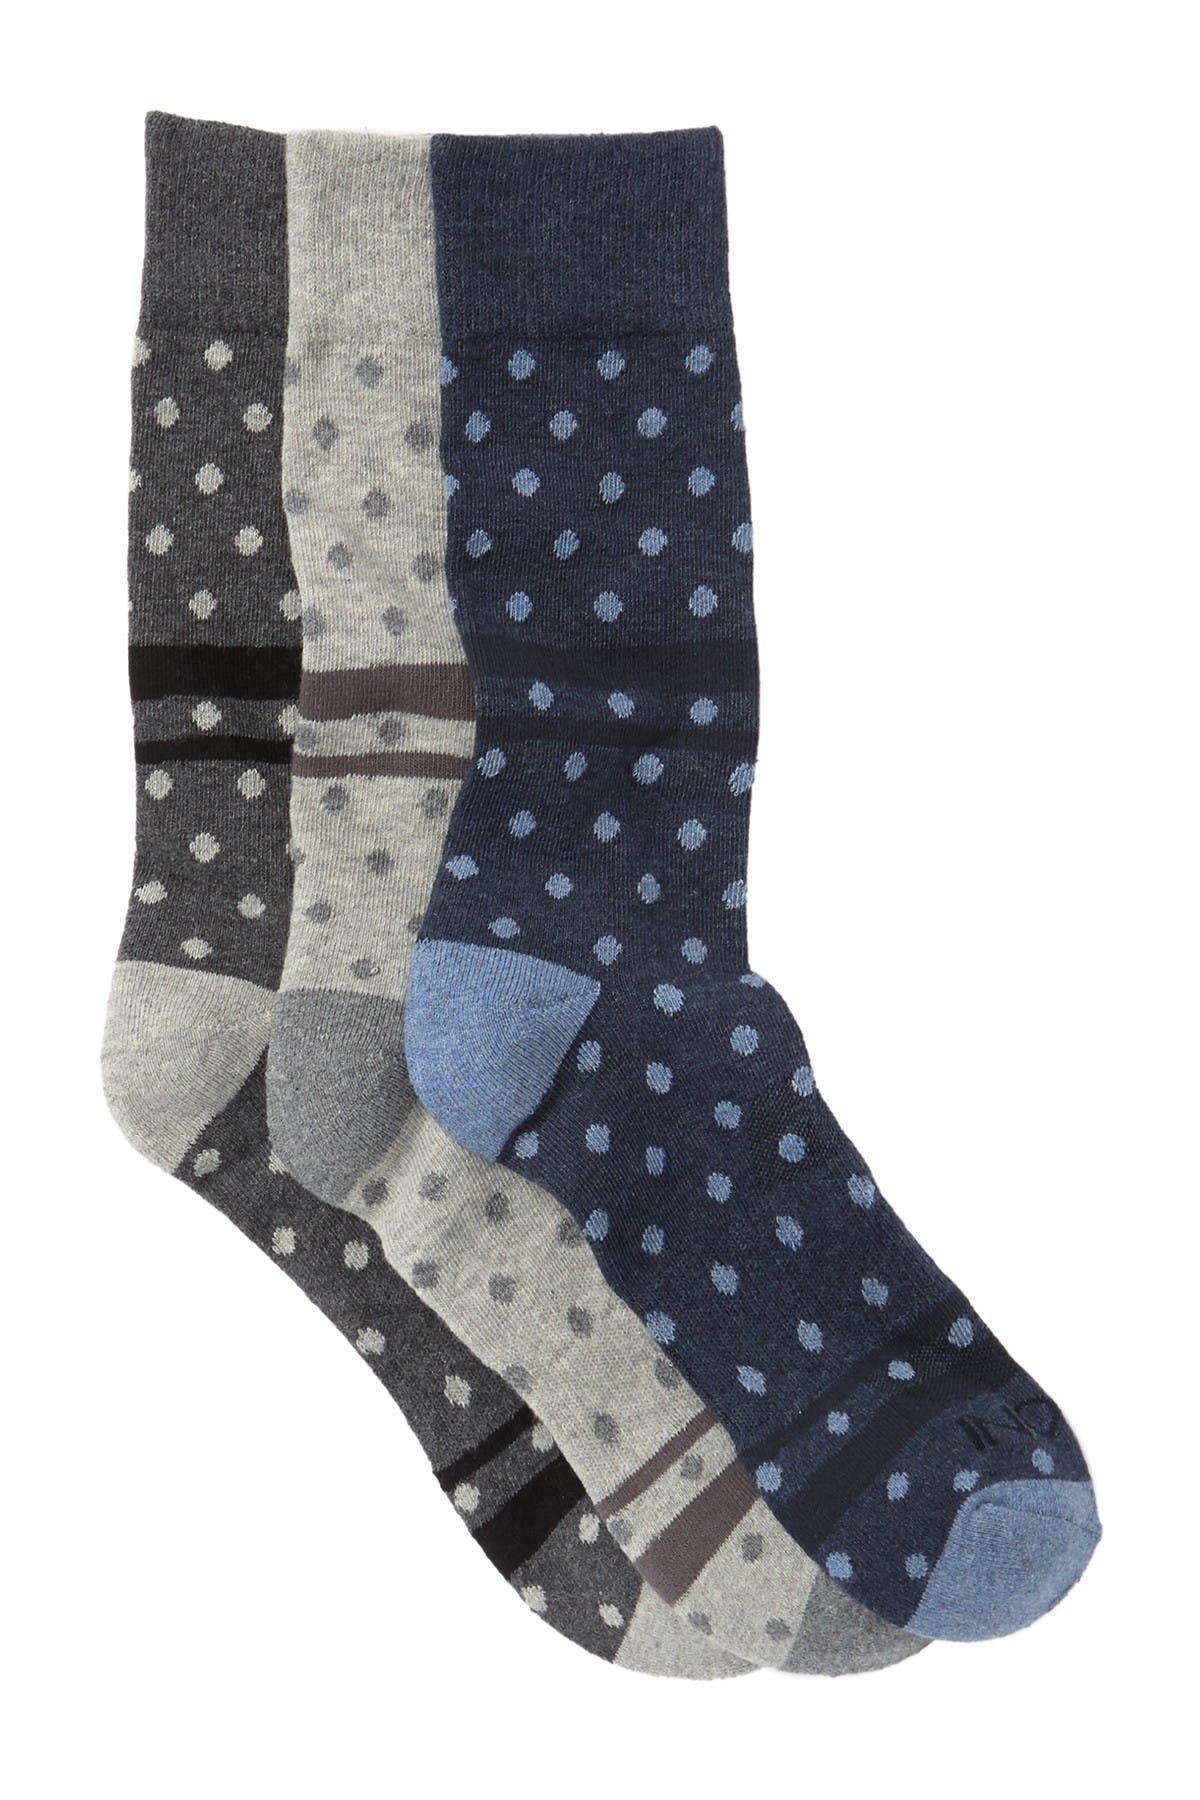 Image of BOCONI Mini Polka Dots Crew Socks - Pack of 3